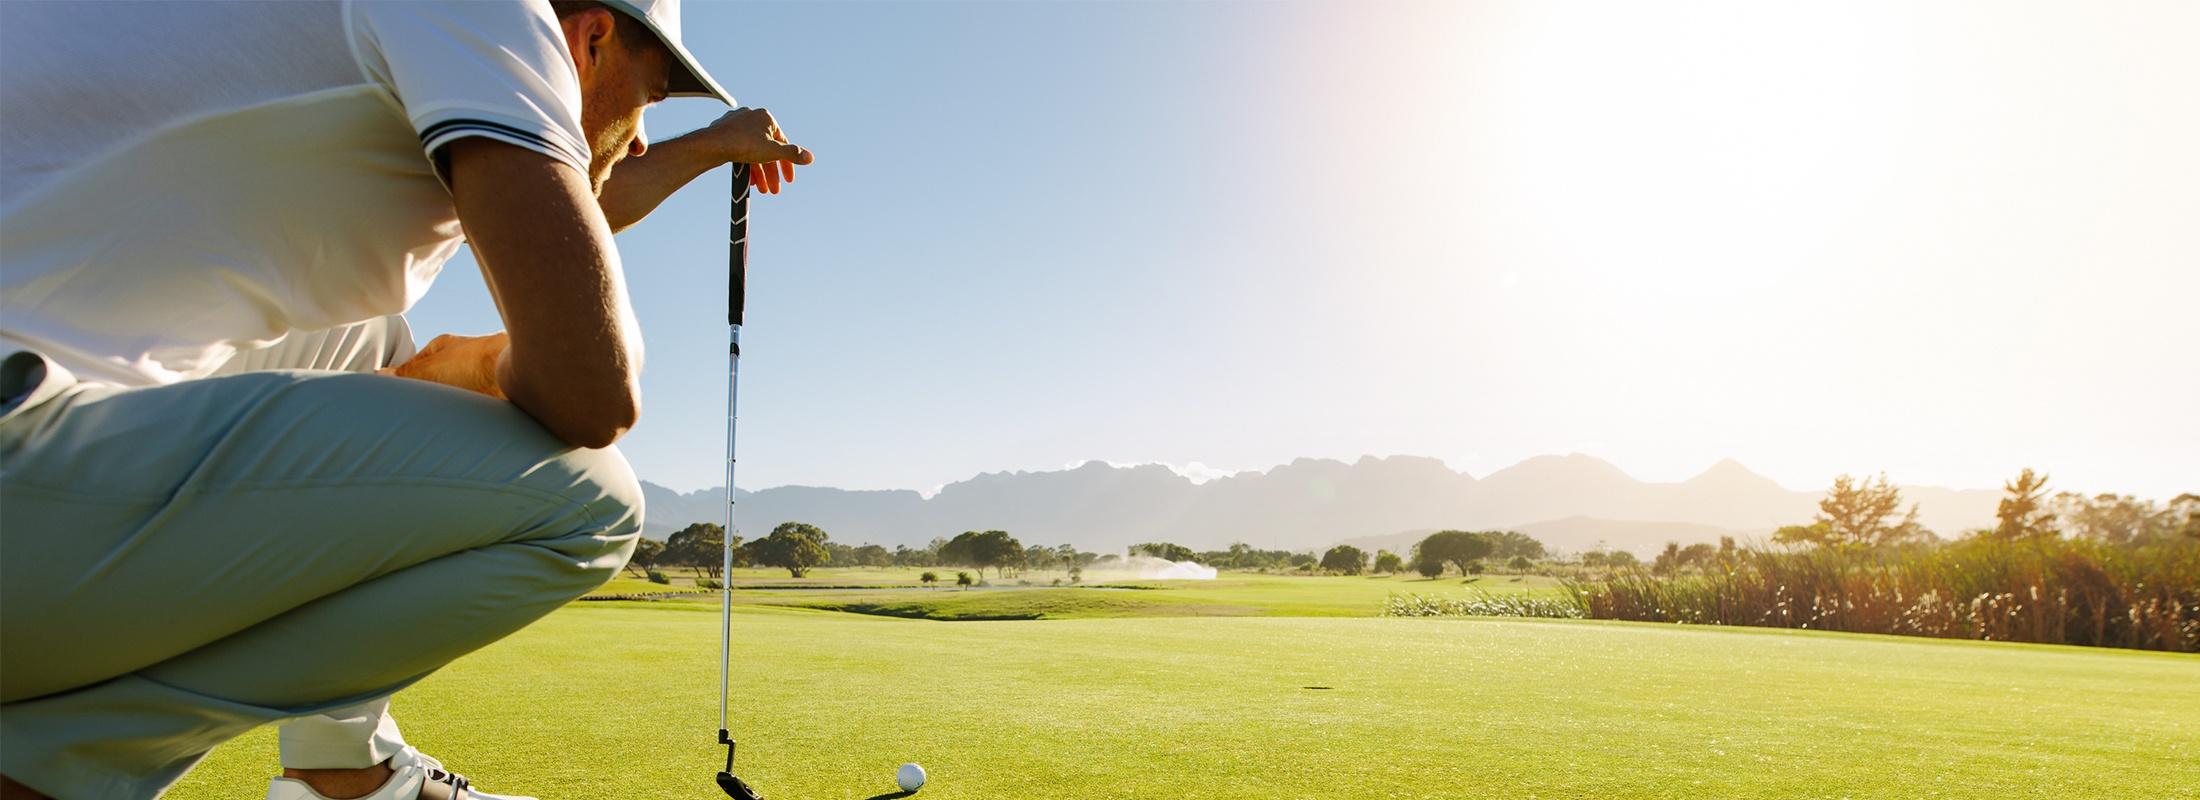 golfer1.jpg